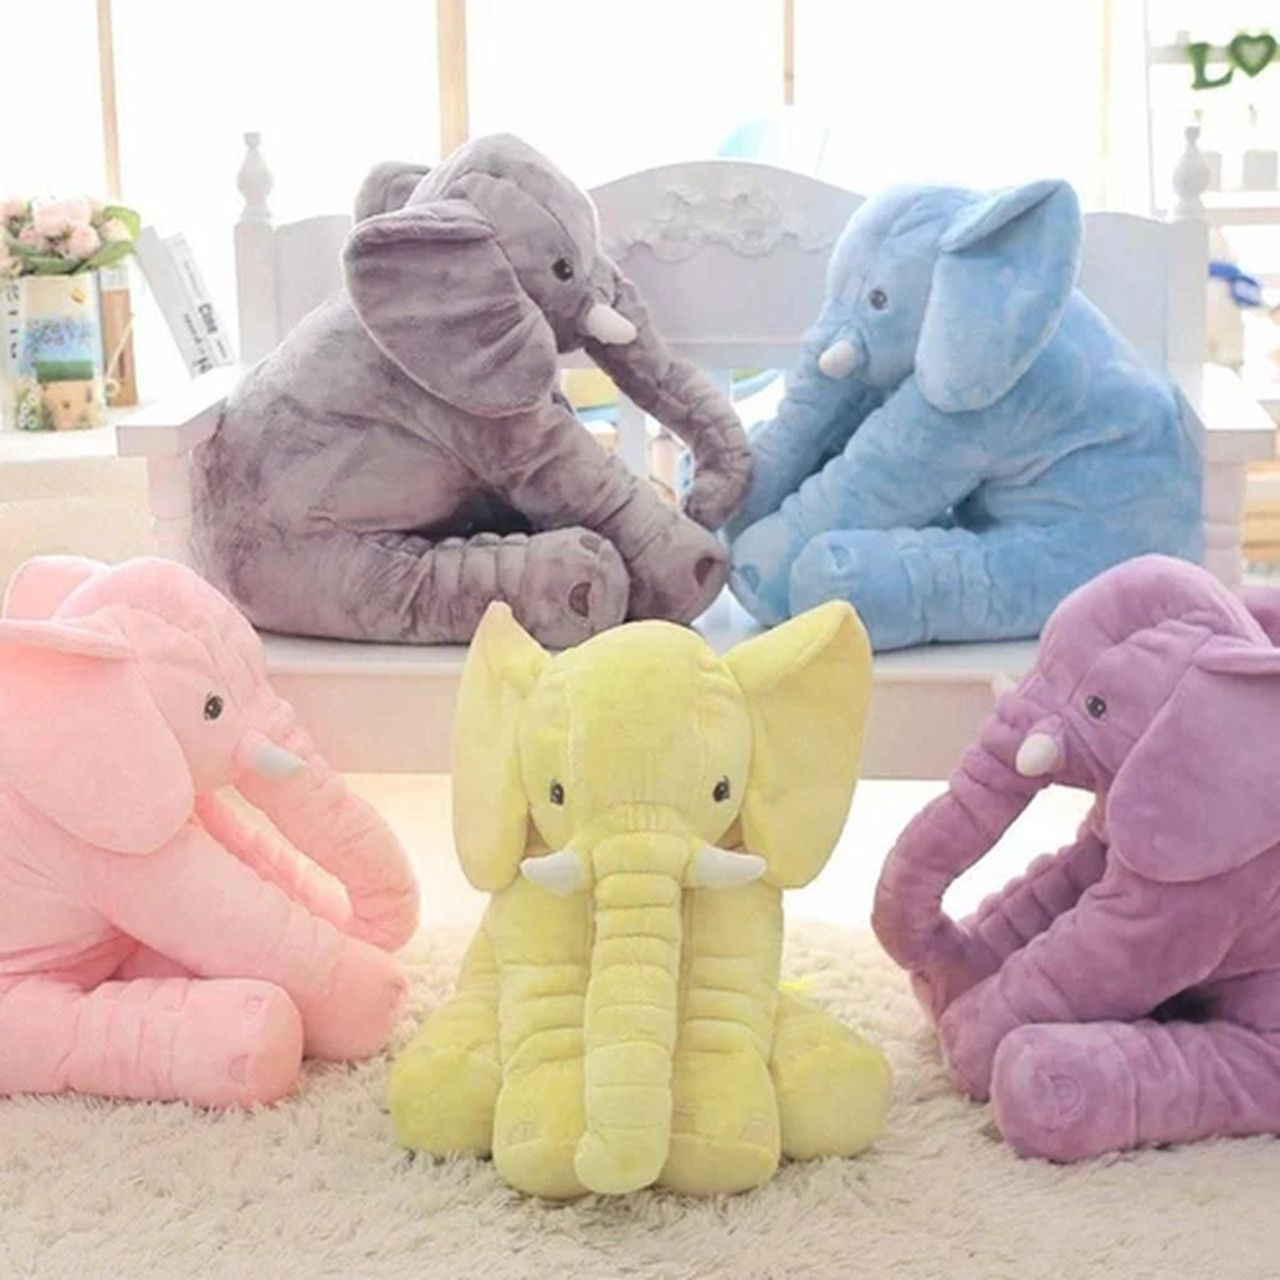 Almofada Elefante Pelúcia 60cm para bebê - 6 cores Toybrink